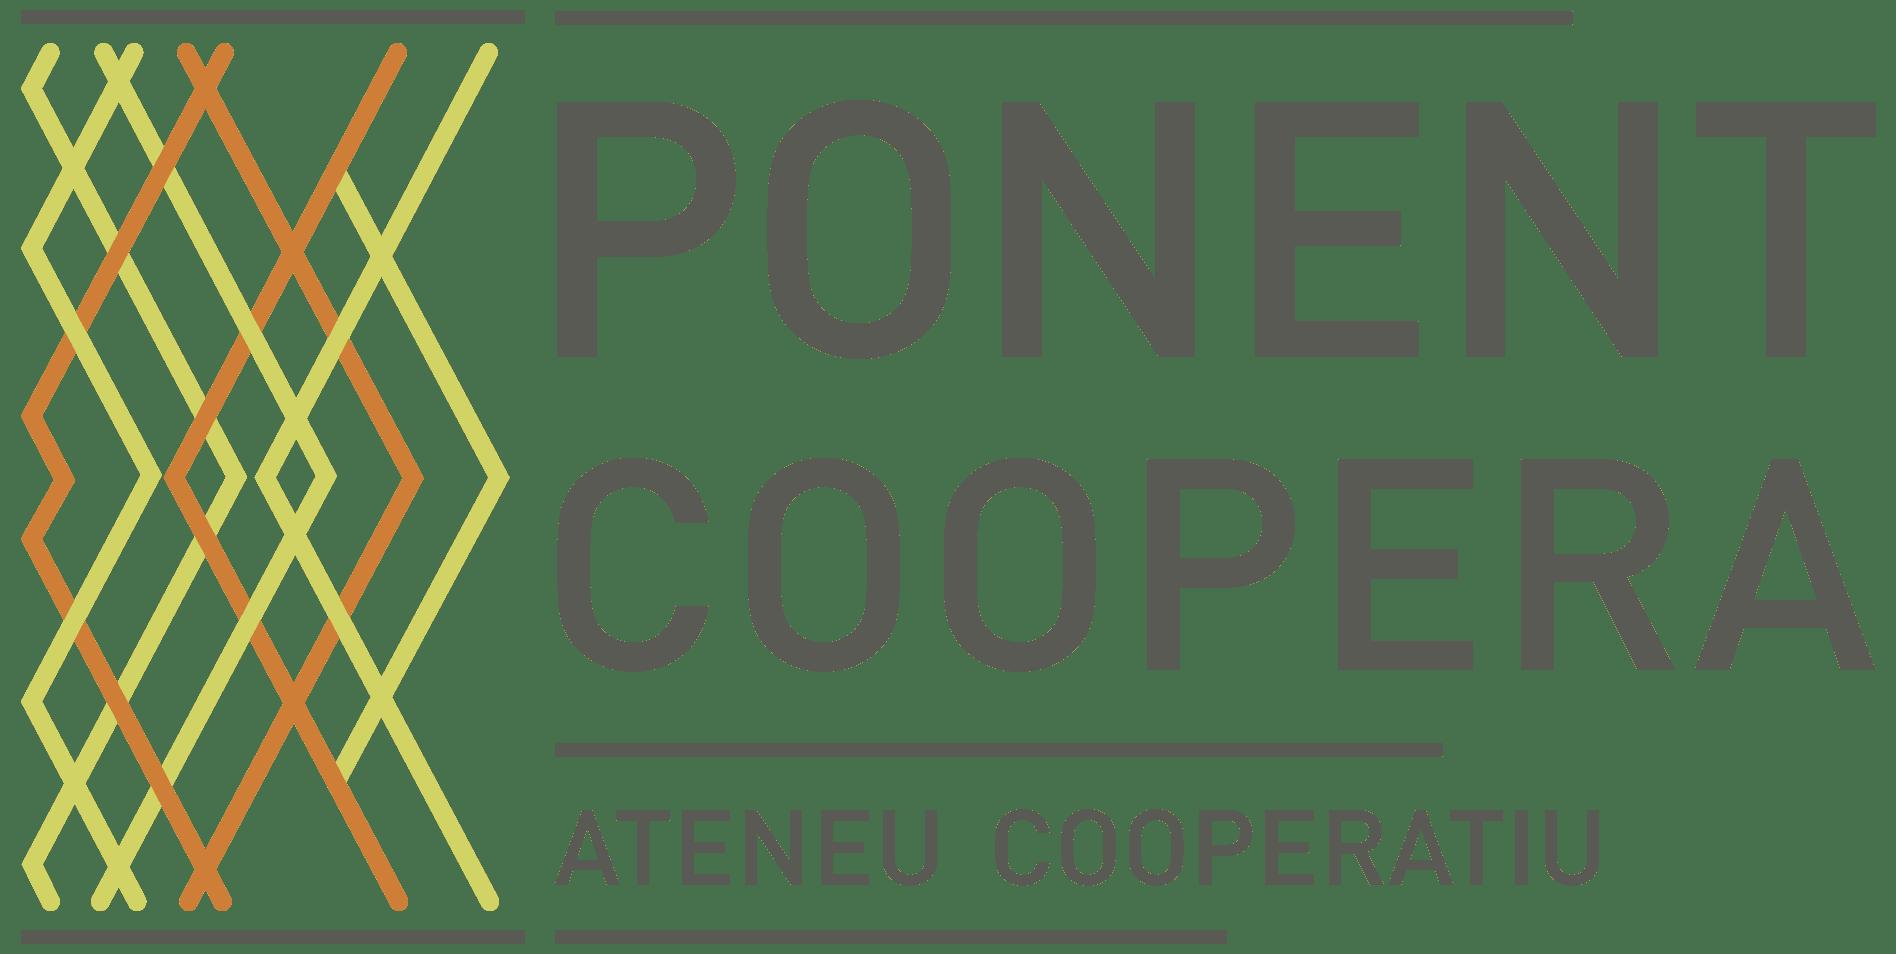 Ponent Coopera